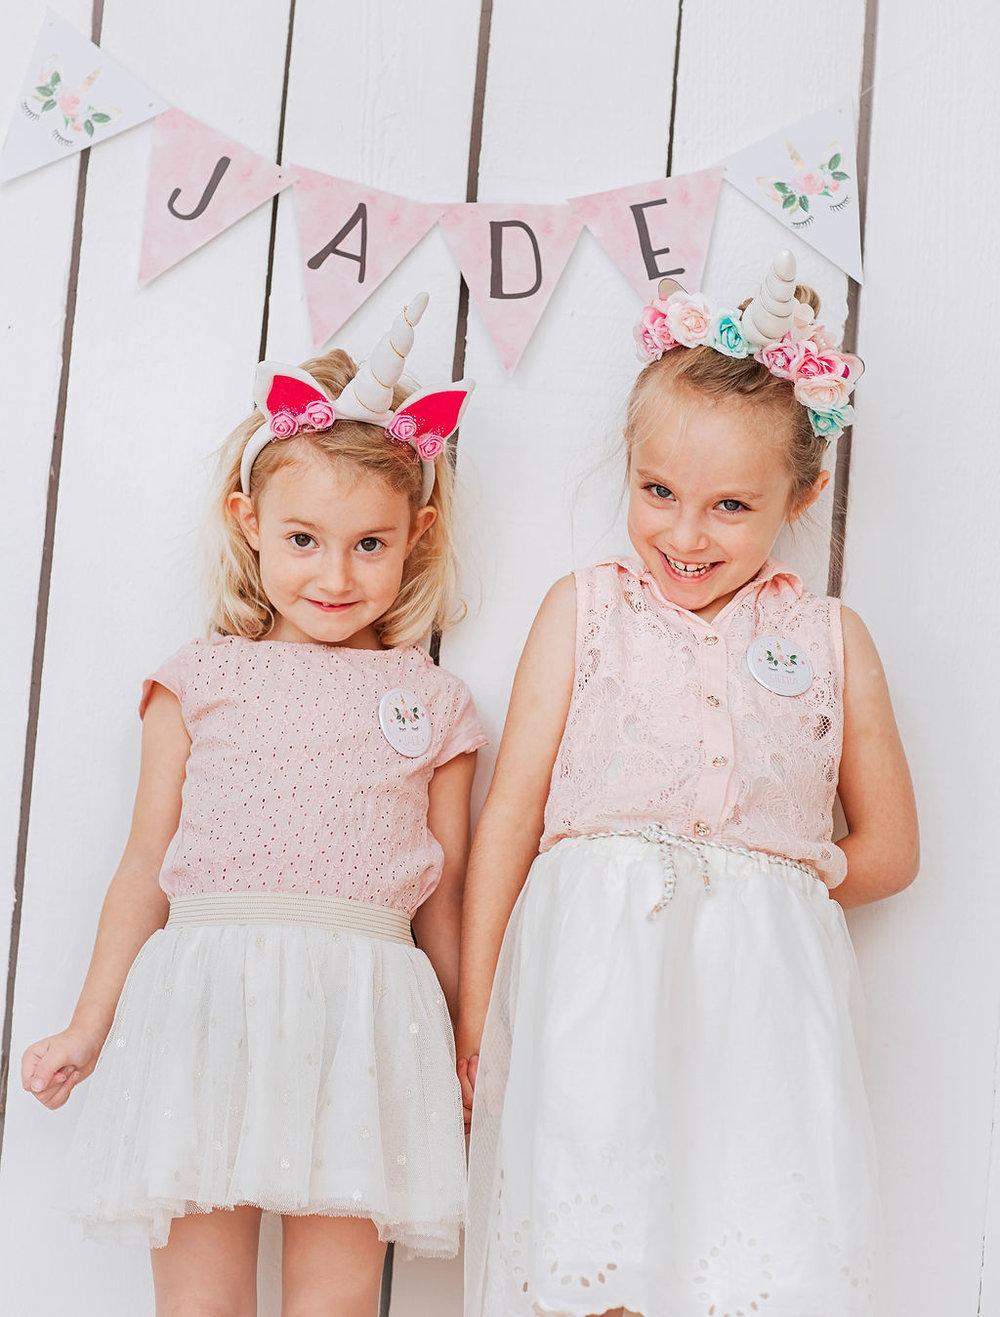 Jade'sBirthday2018--11.jpg